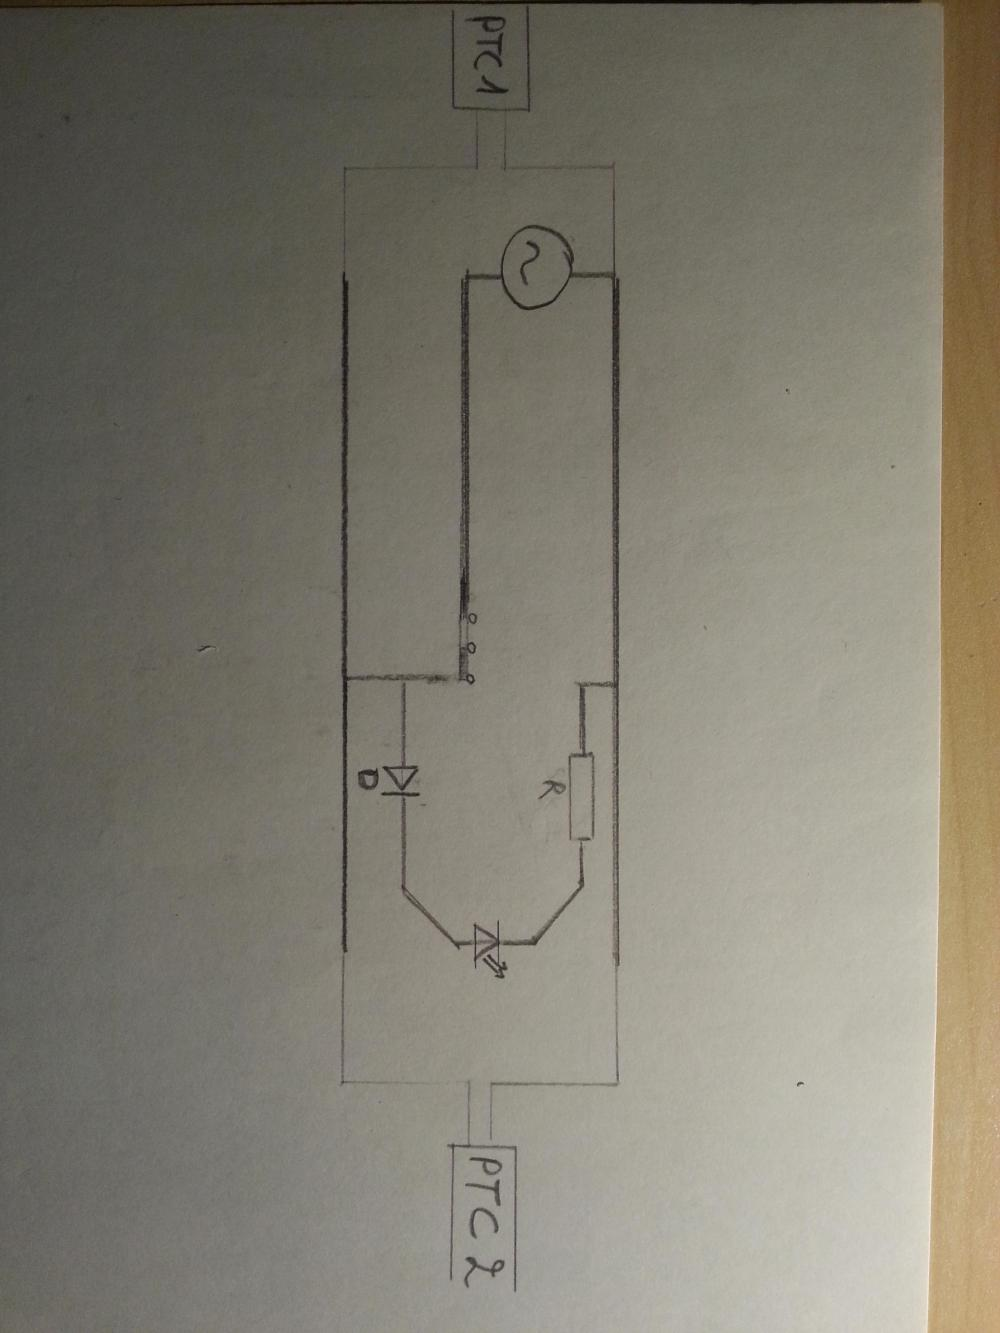 medium resolution of electric circuit